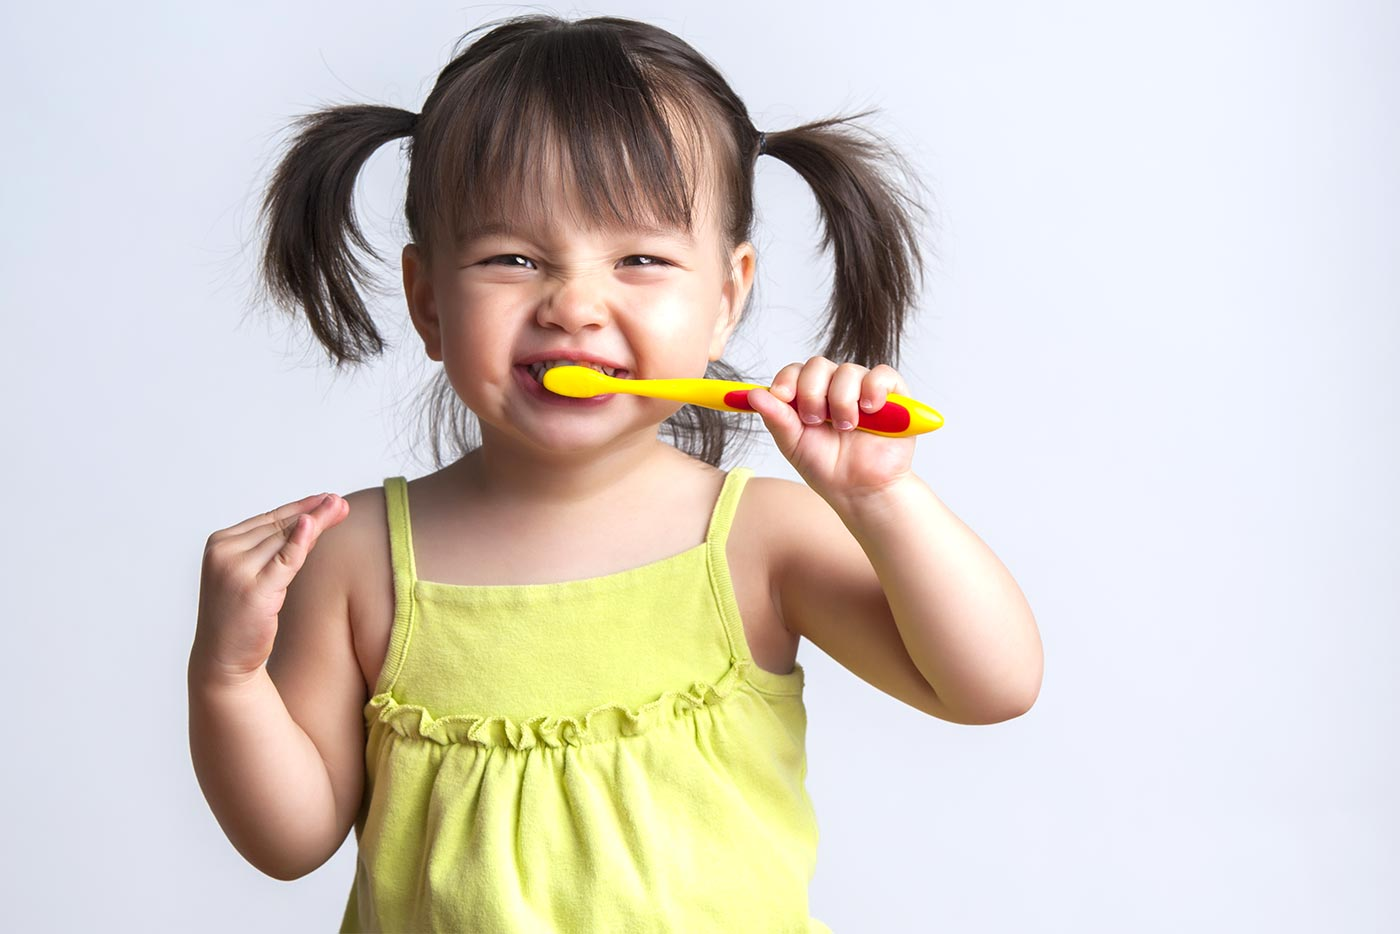 How to establish toddler routines